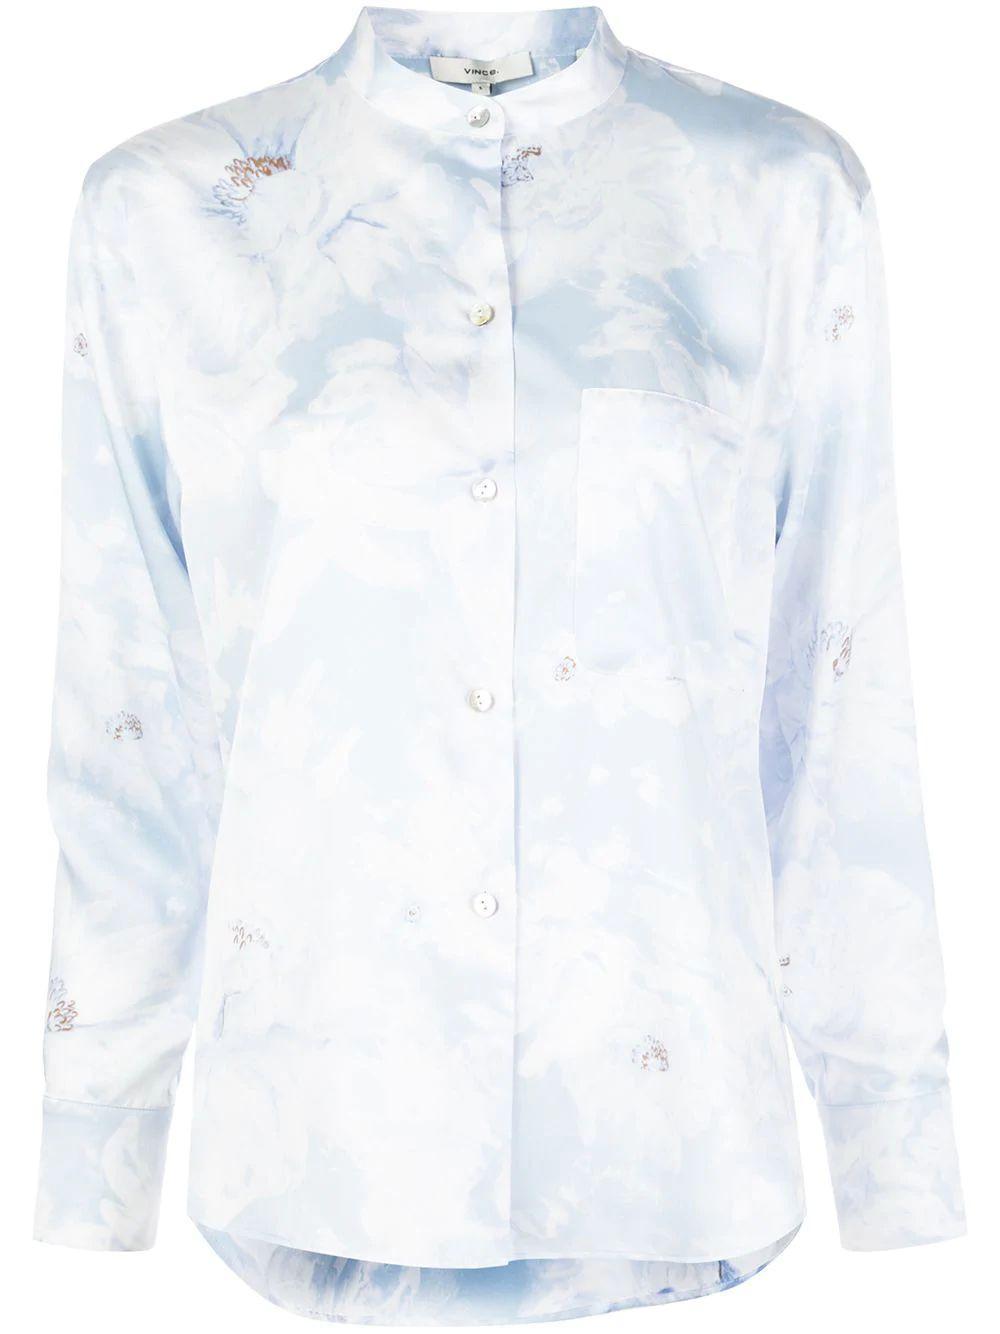 Painted Magnolia Blouse Item # V651012321